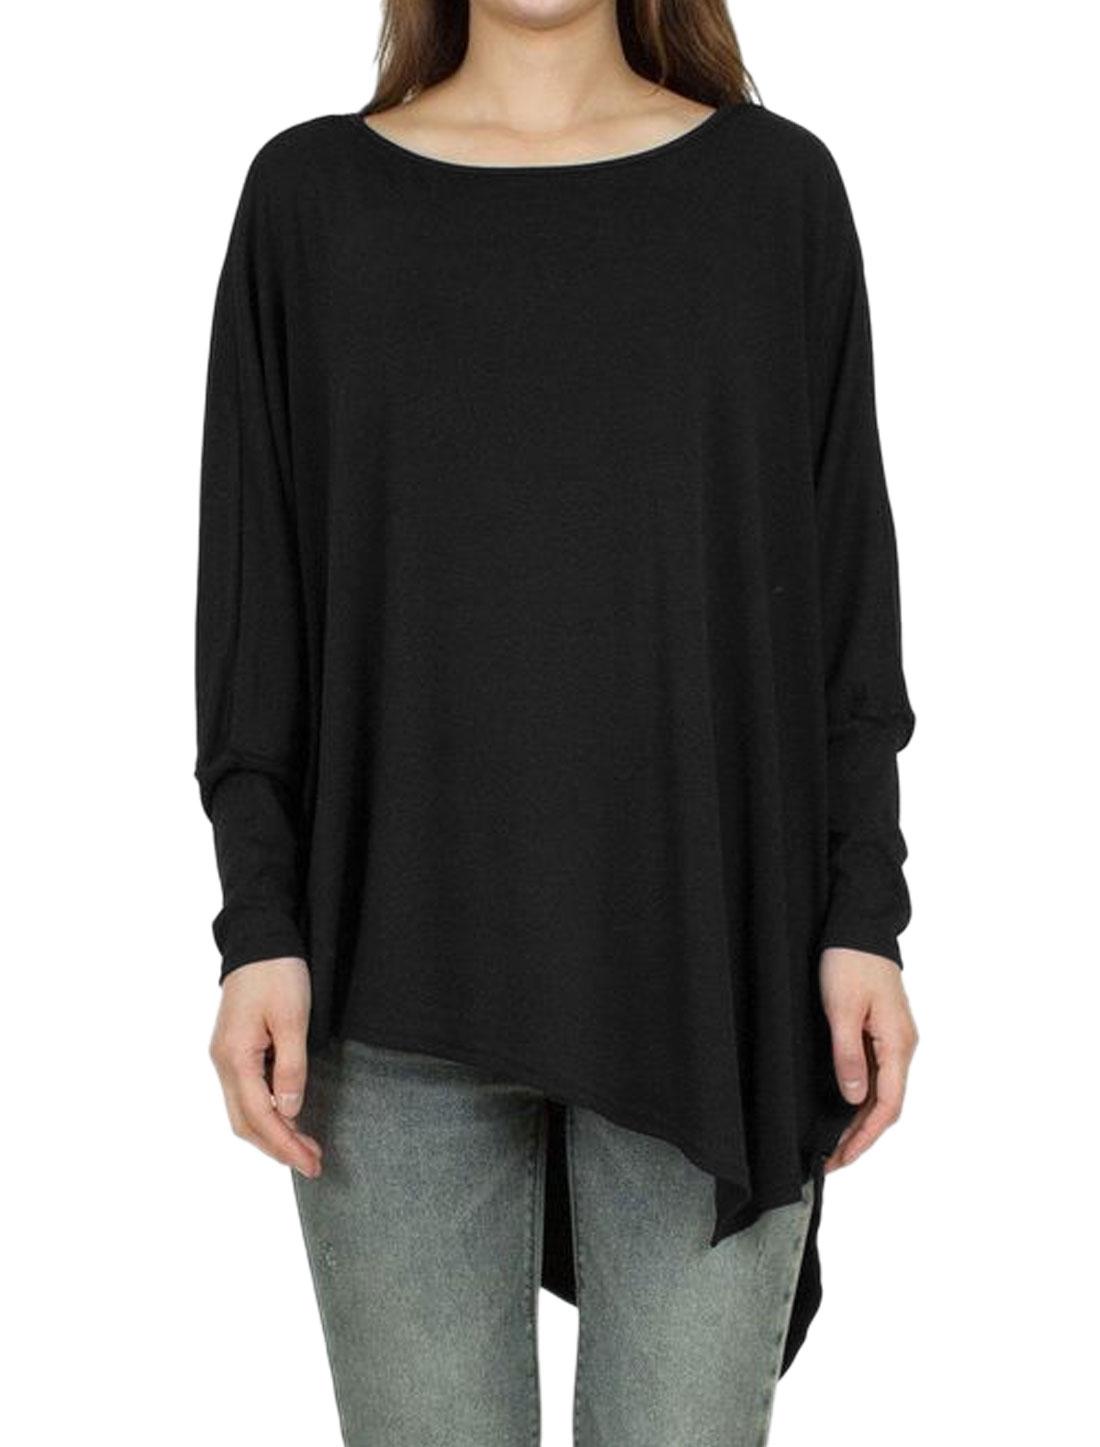 Lady Long Dolman Sleeves Round Neck Asymmetric Hem Tunic T-Shirt Black M